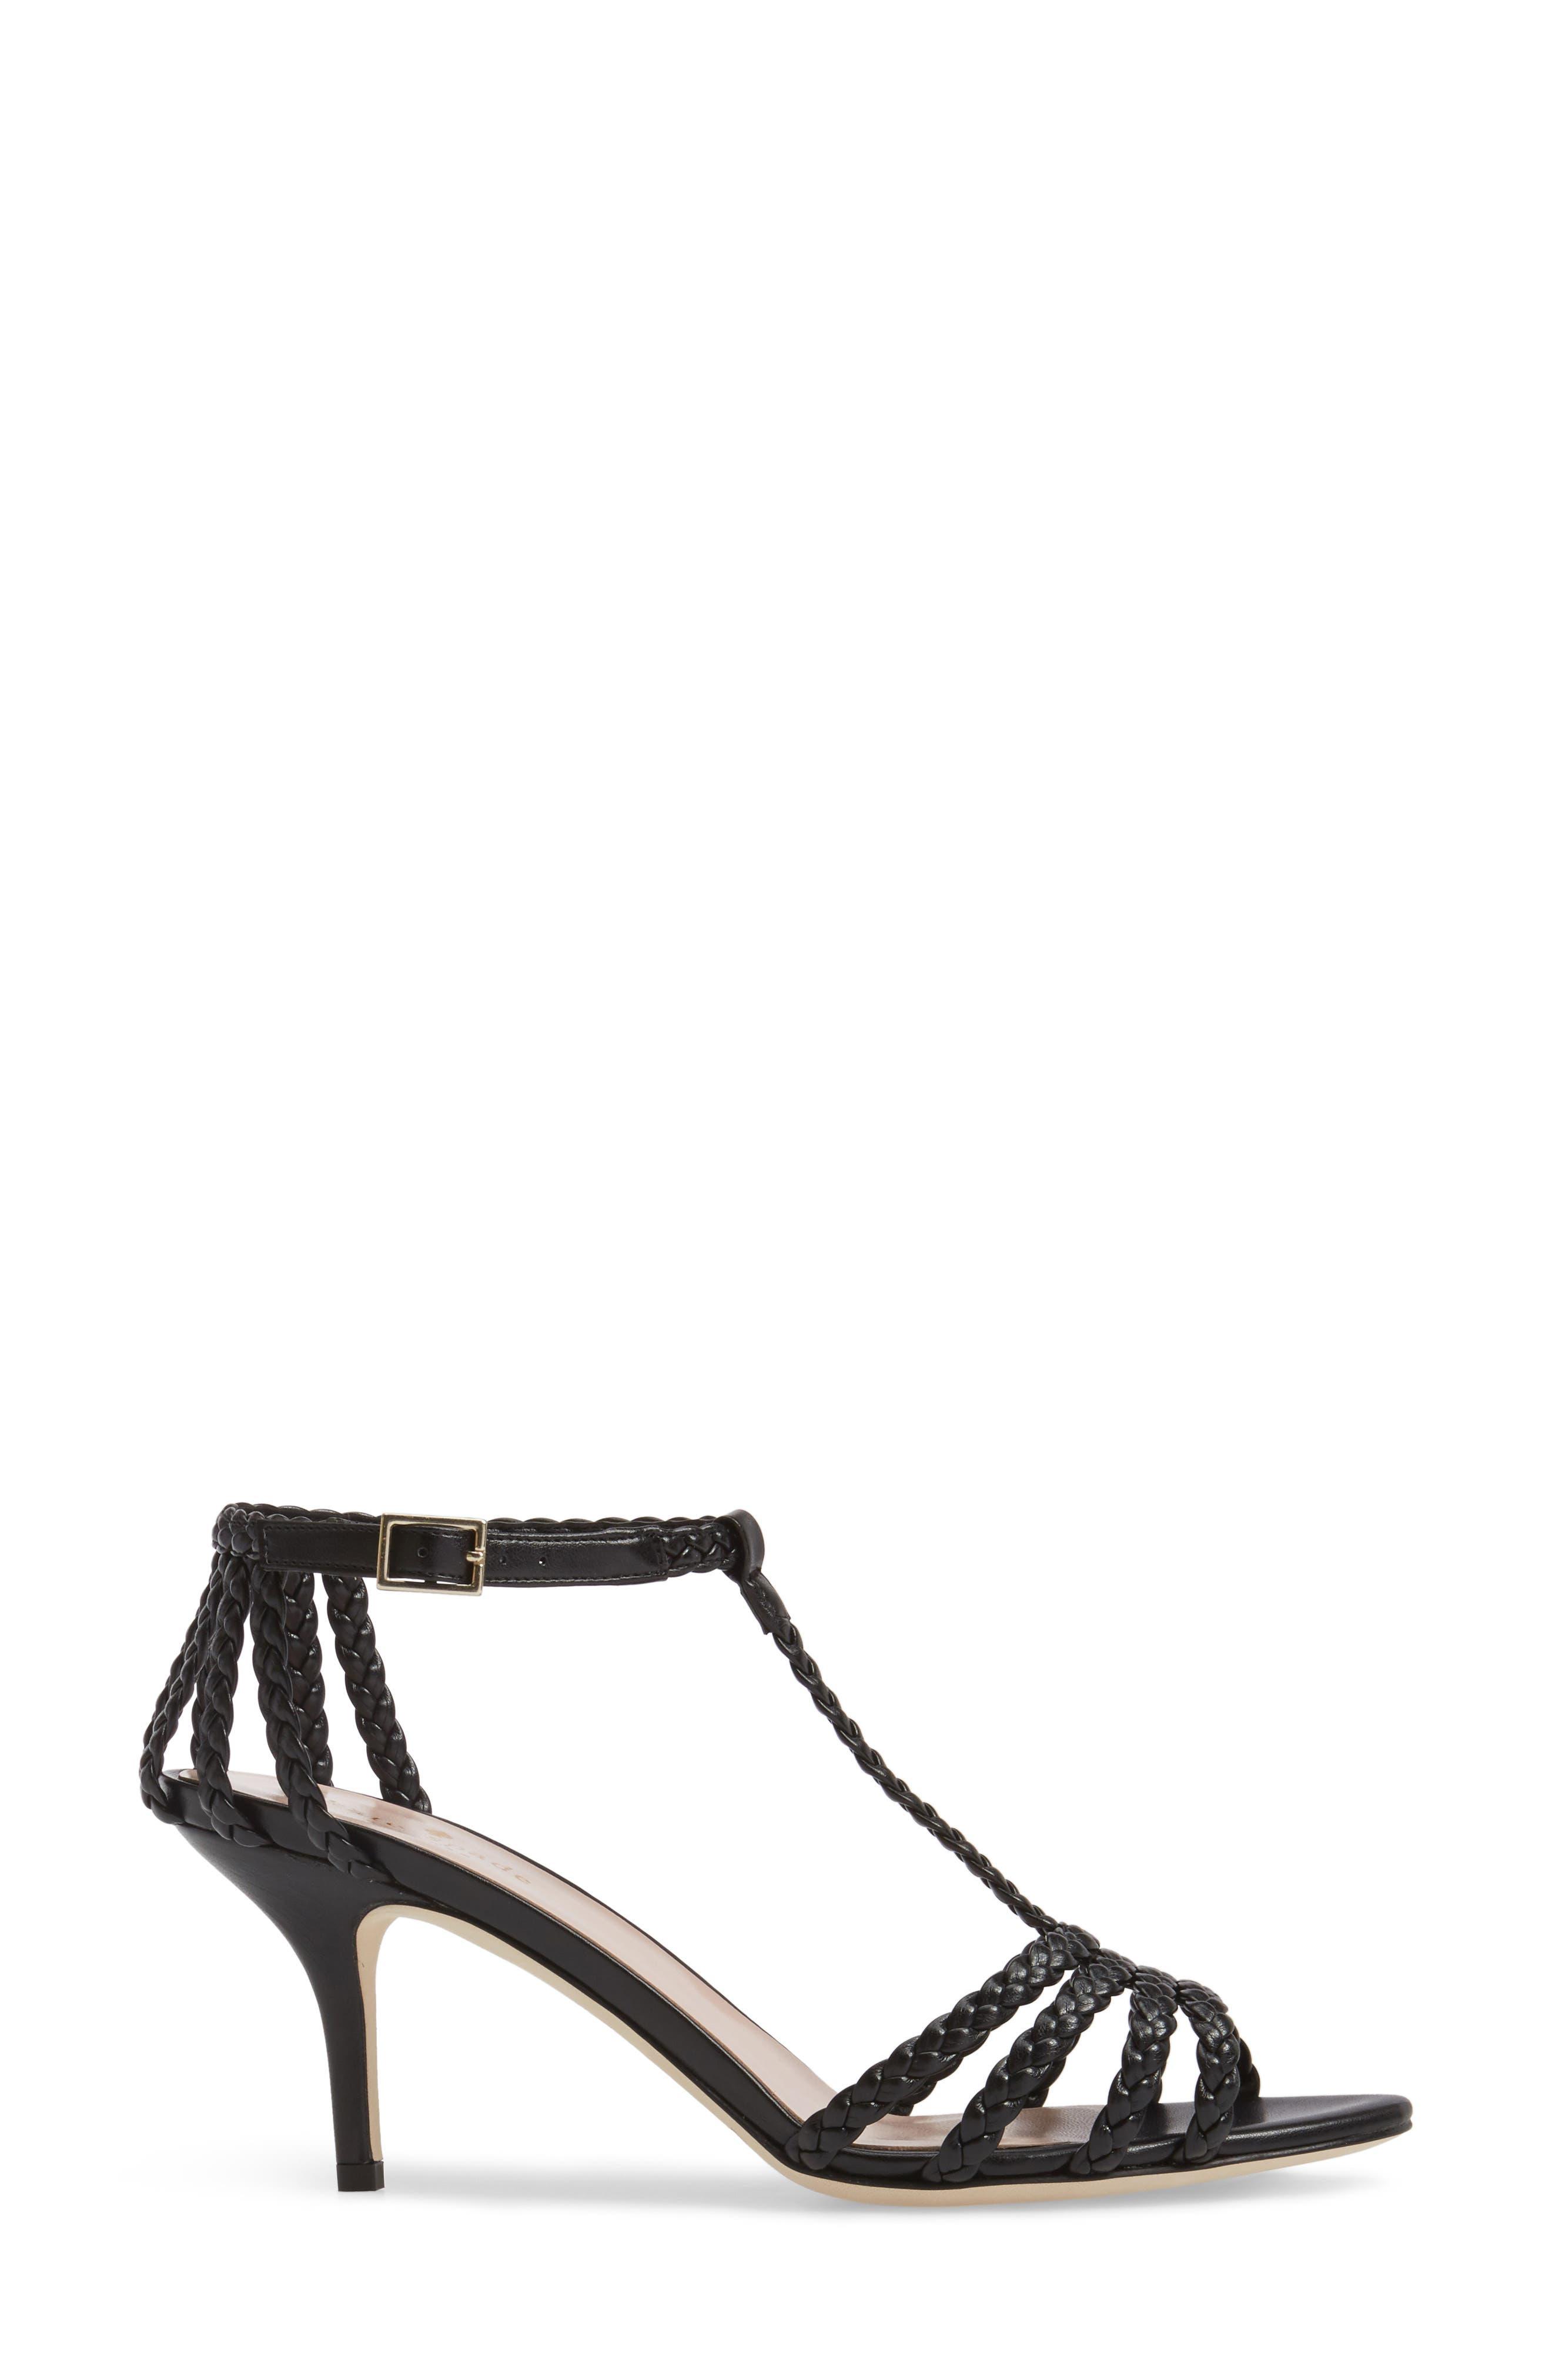 sullivan strappy sandal,                             Alternate thumbnail 3, color,                             001